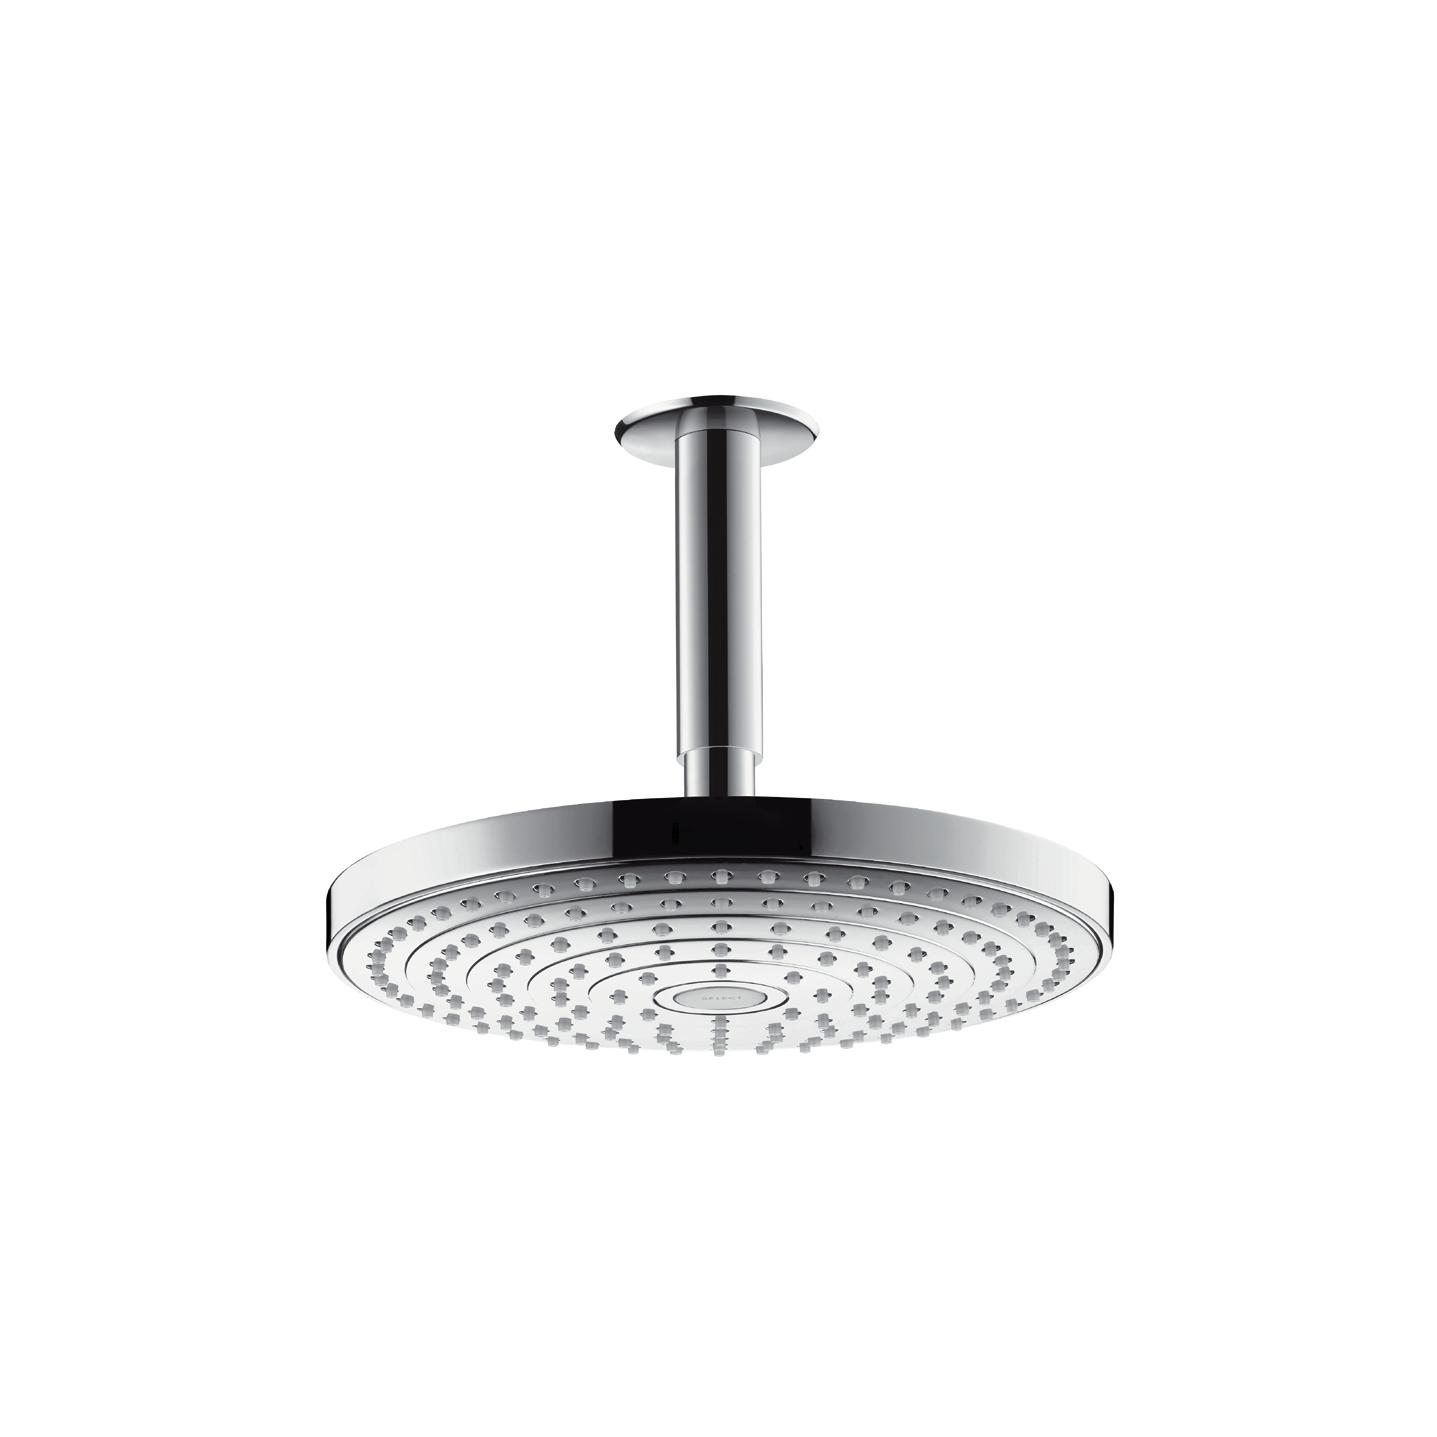 Details About Hansgrohe Shower Head Raindance Select S 240 26467000